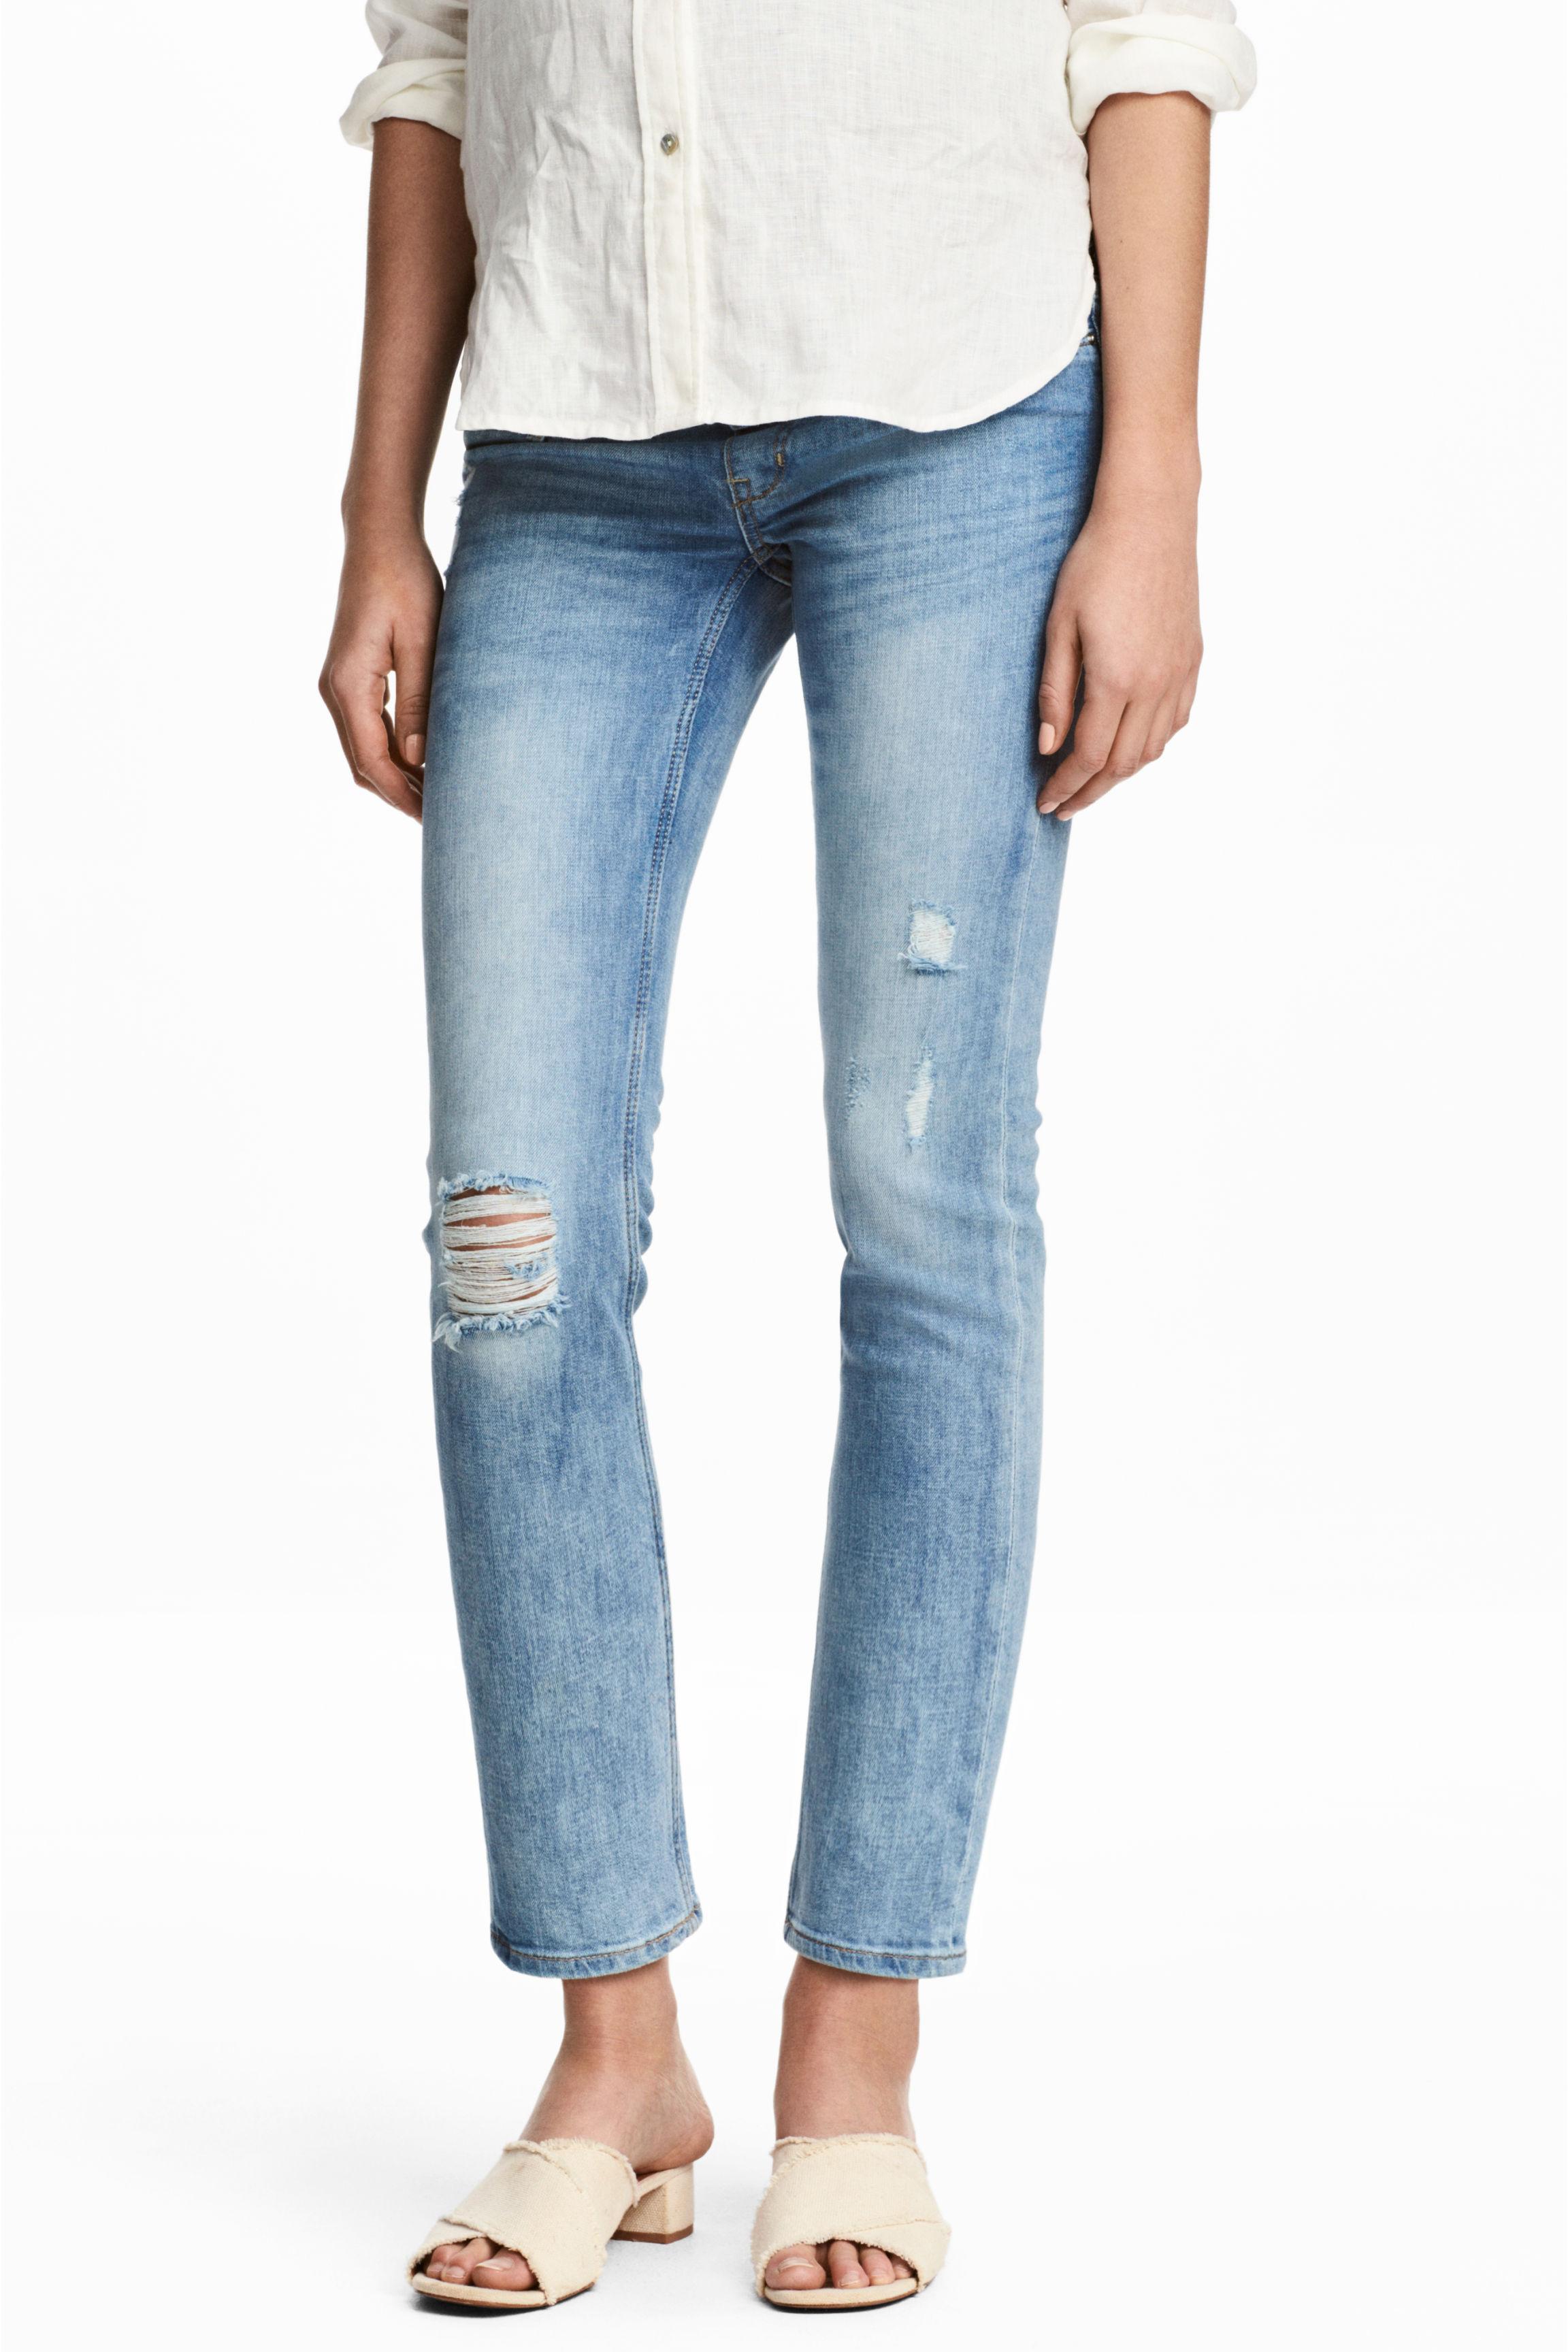 2fef6ae89597e MAMA Skinny Ankle Jeans - Azul denim claro - MUJER | H&M ES